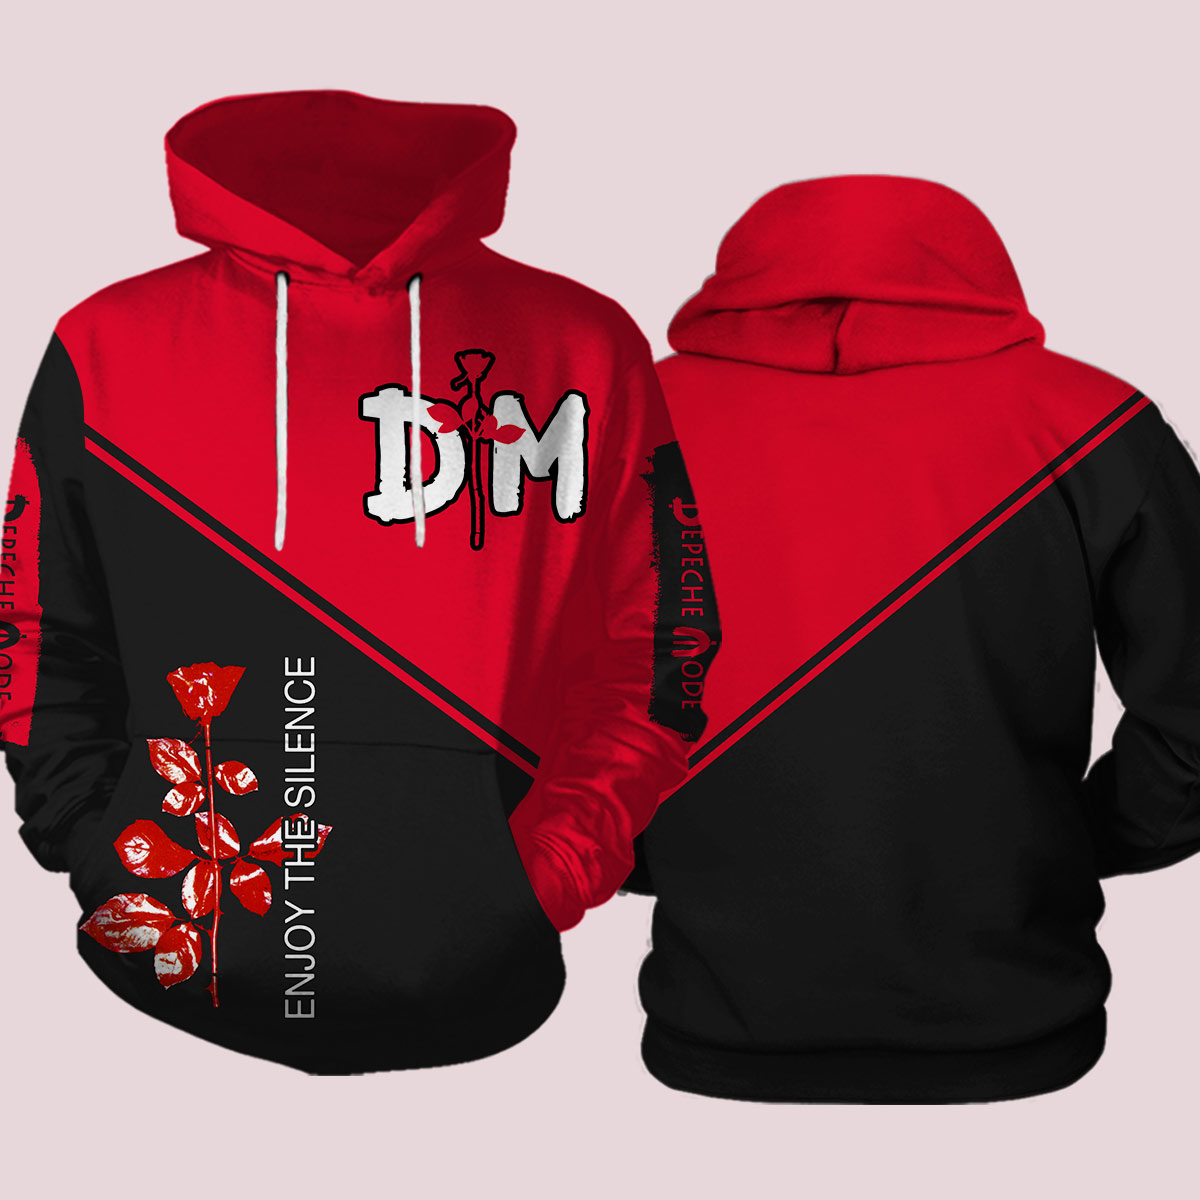 Depeche mode enjoy the silence all over print hoodie